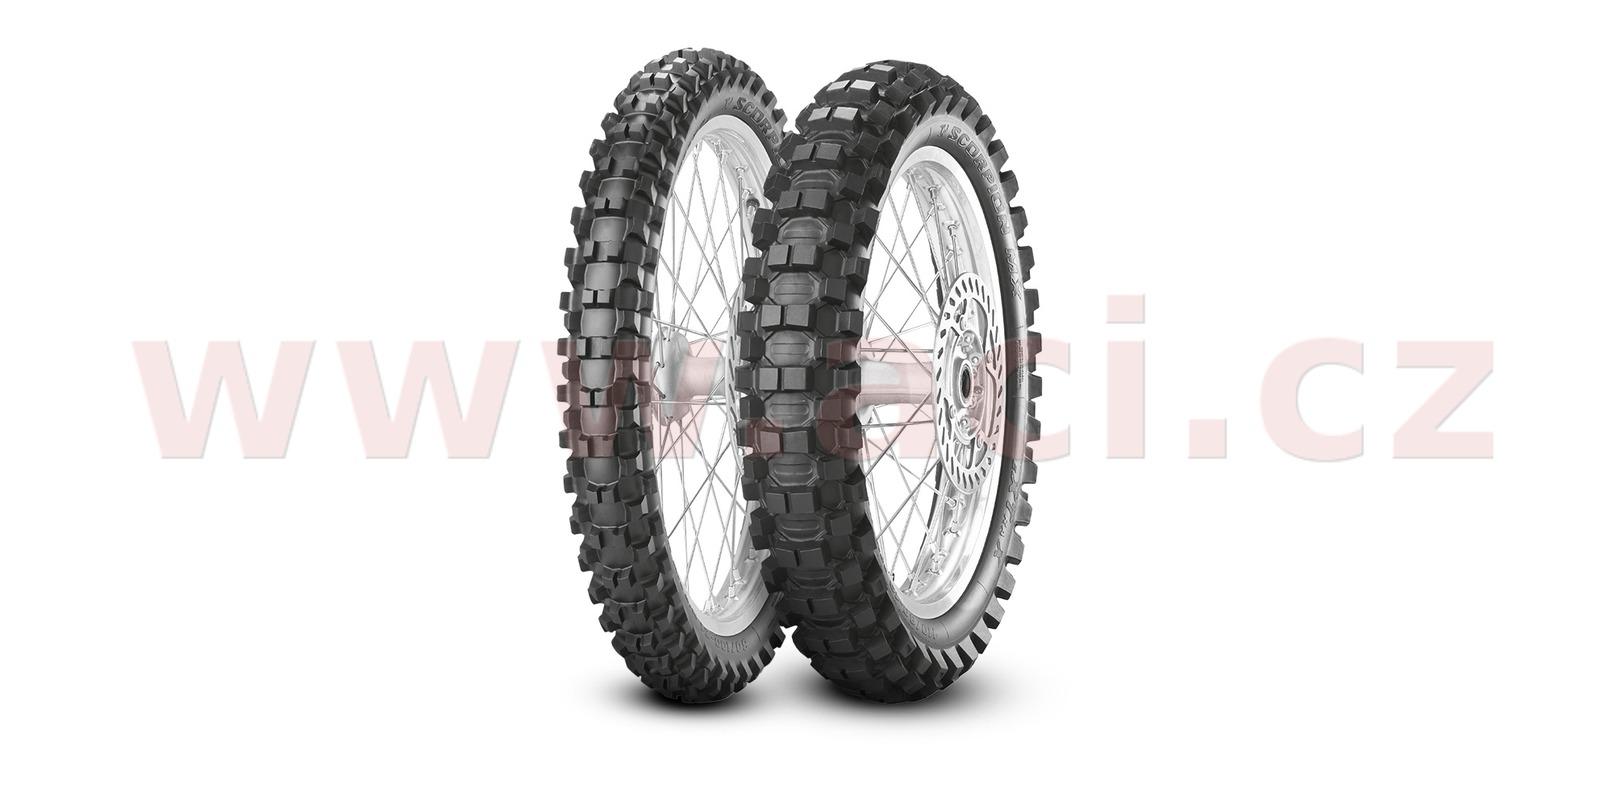 Pneu 110/90-19 (62M) Scorpion MX EXTRA - Pirelli